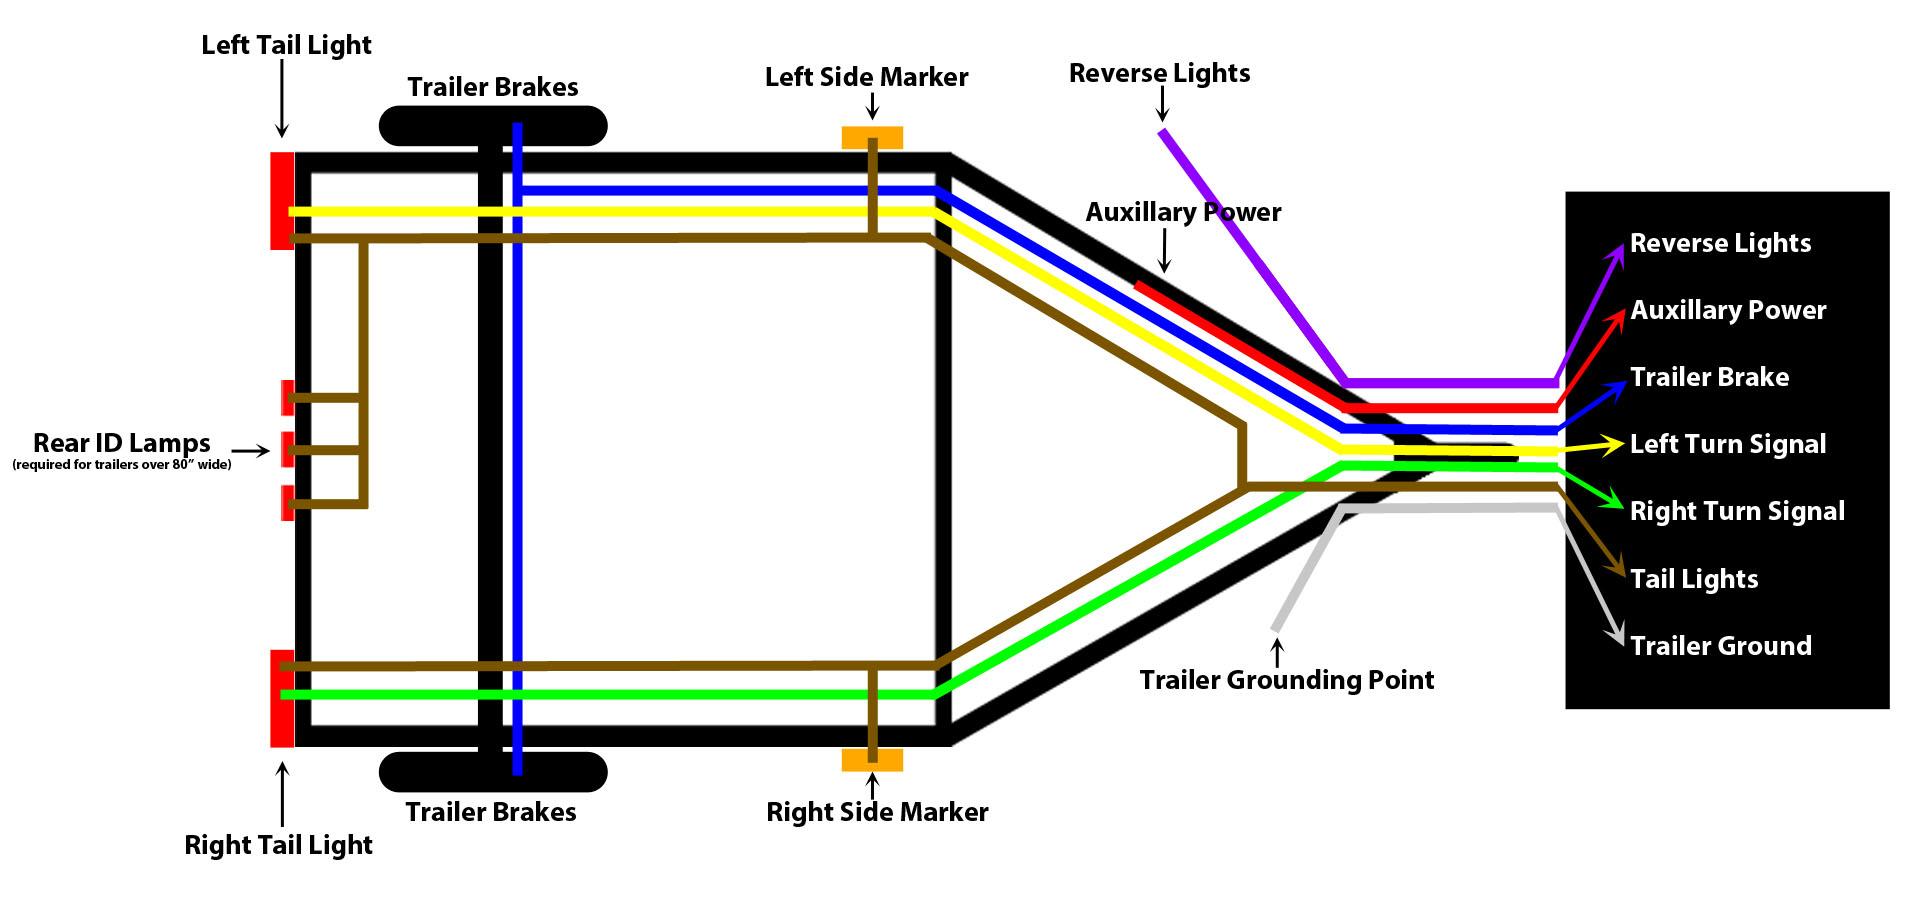 standard 7 wire trailer diagram electronic schematics collectionswiring diagram utility trailer electronic schematics collectionswiring diagram for trailors 8 smo zionsnowboards de \\\\